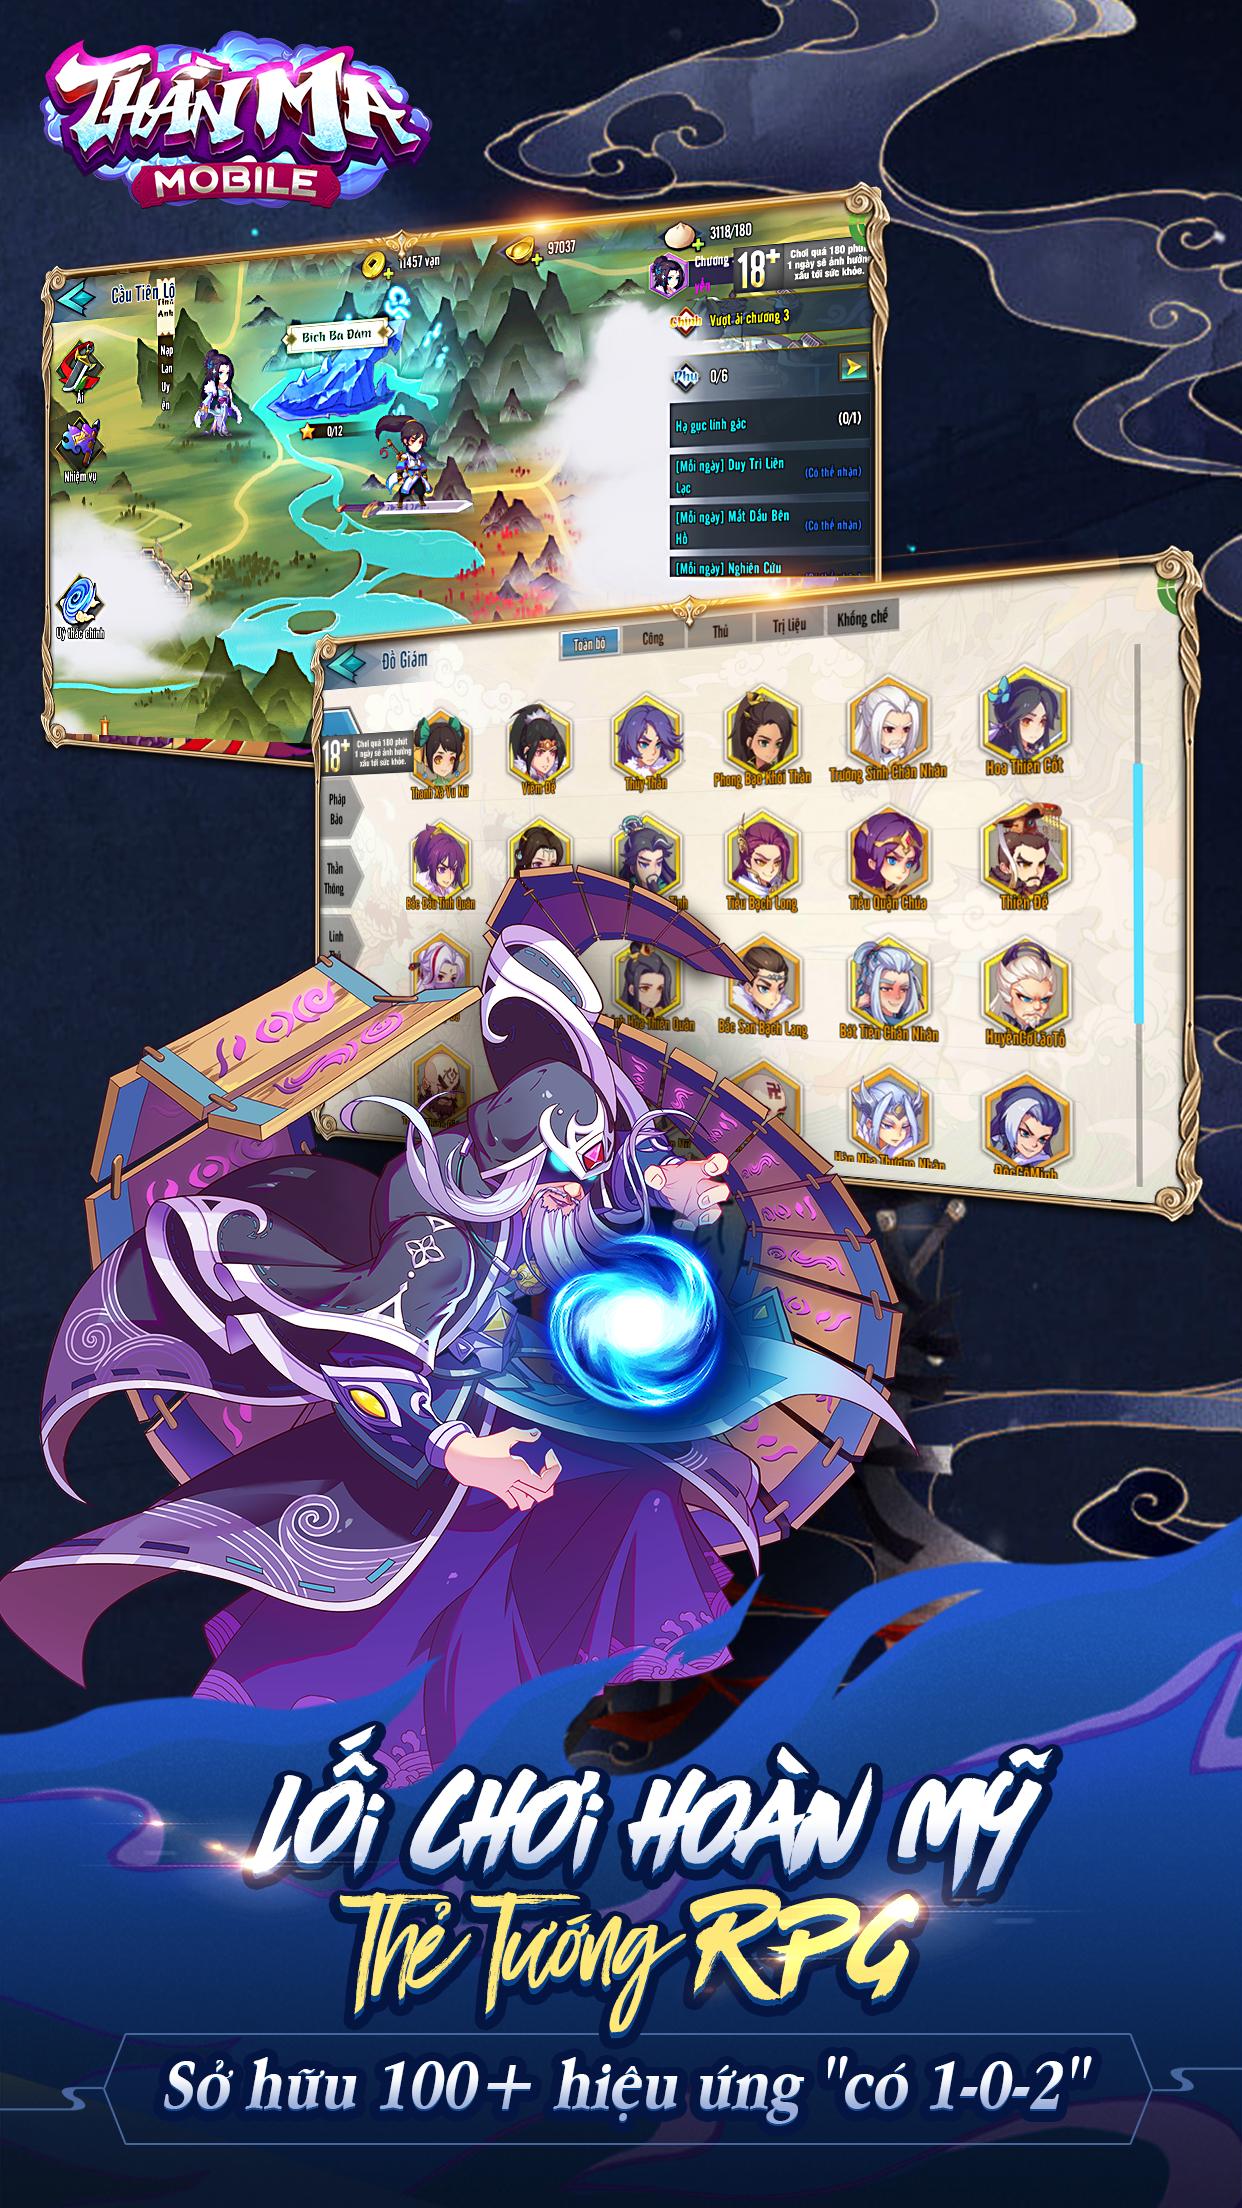 huong-dan-gioi-thieu-game-than-ma-mobile